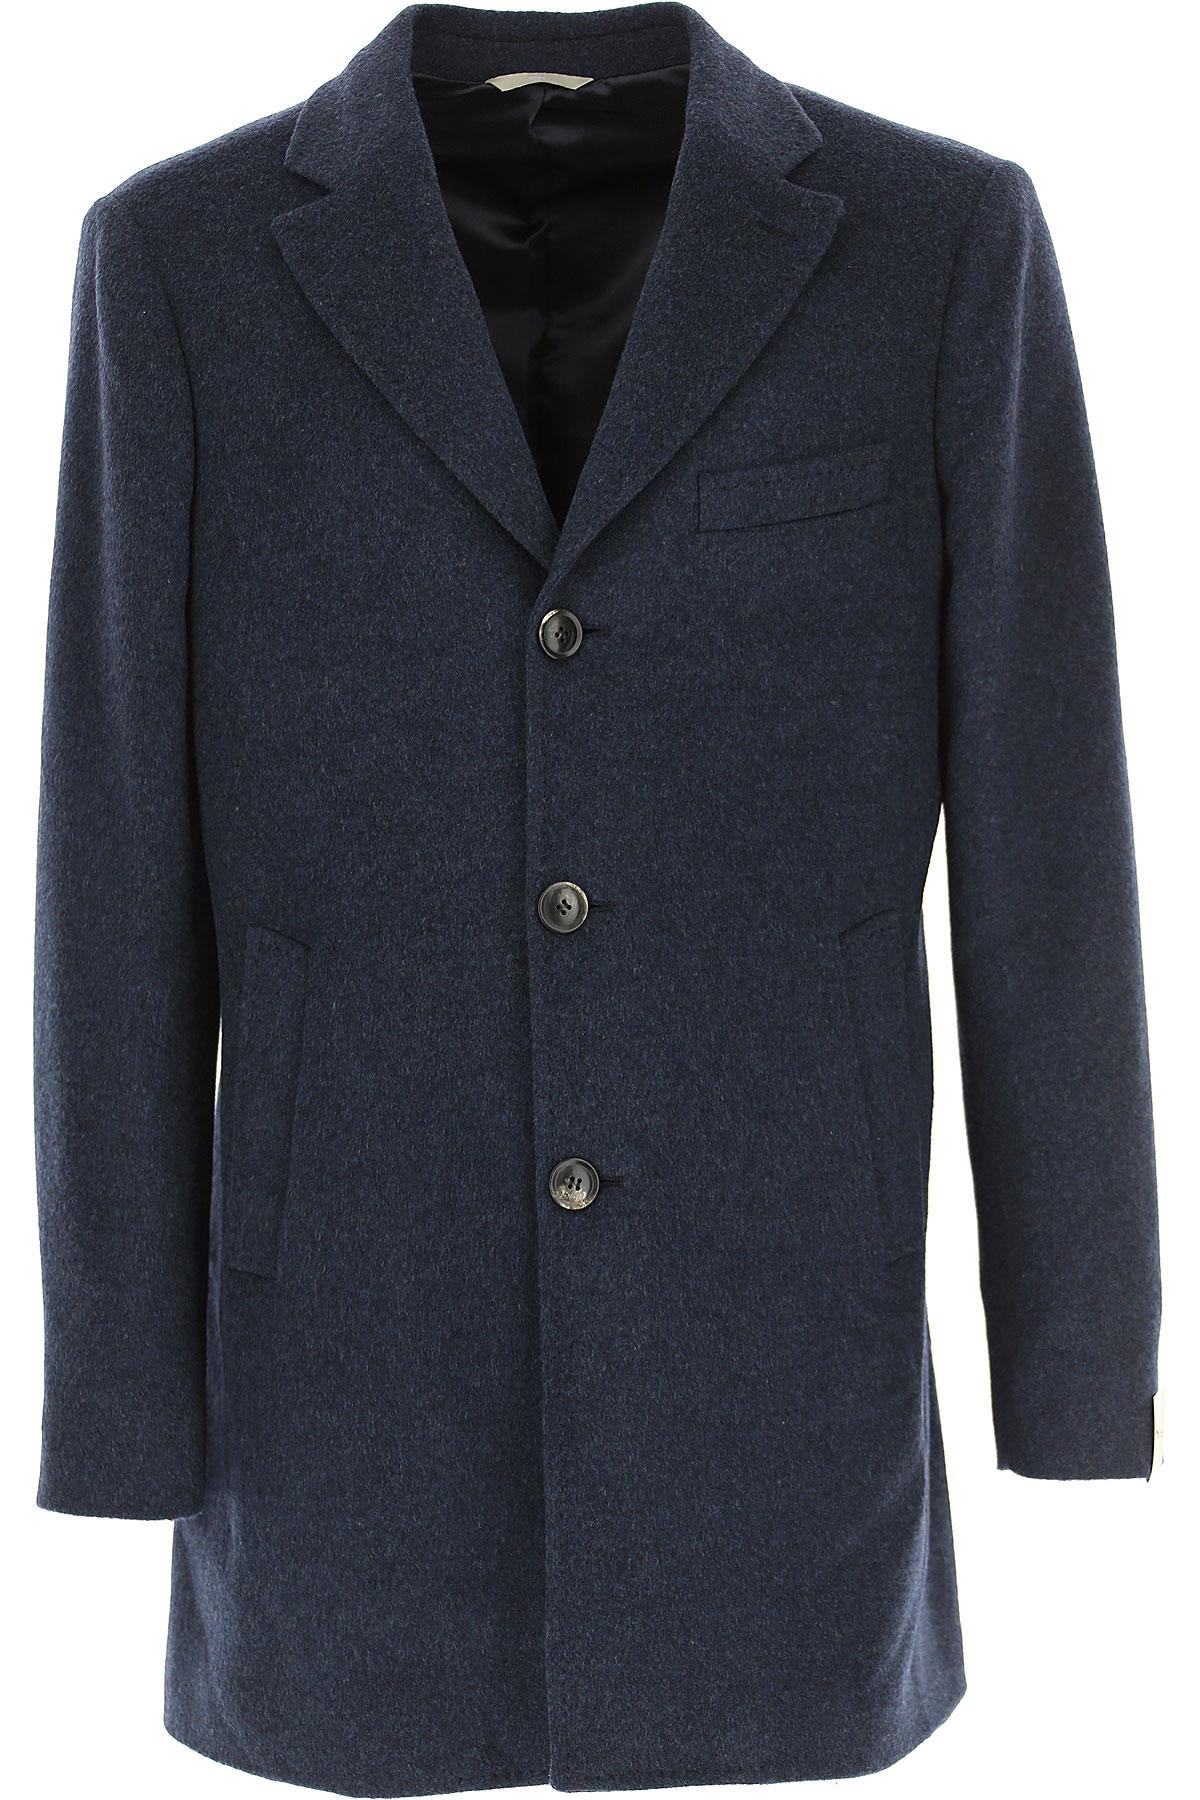 Simbols Men's Coat, Midnight Blue, Wool, 2019, L M S